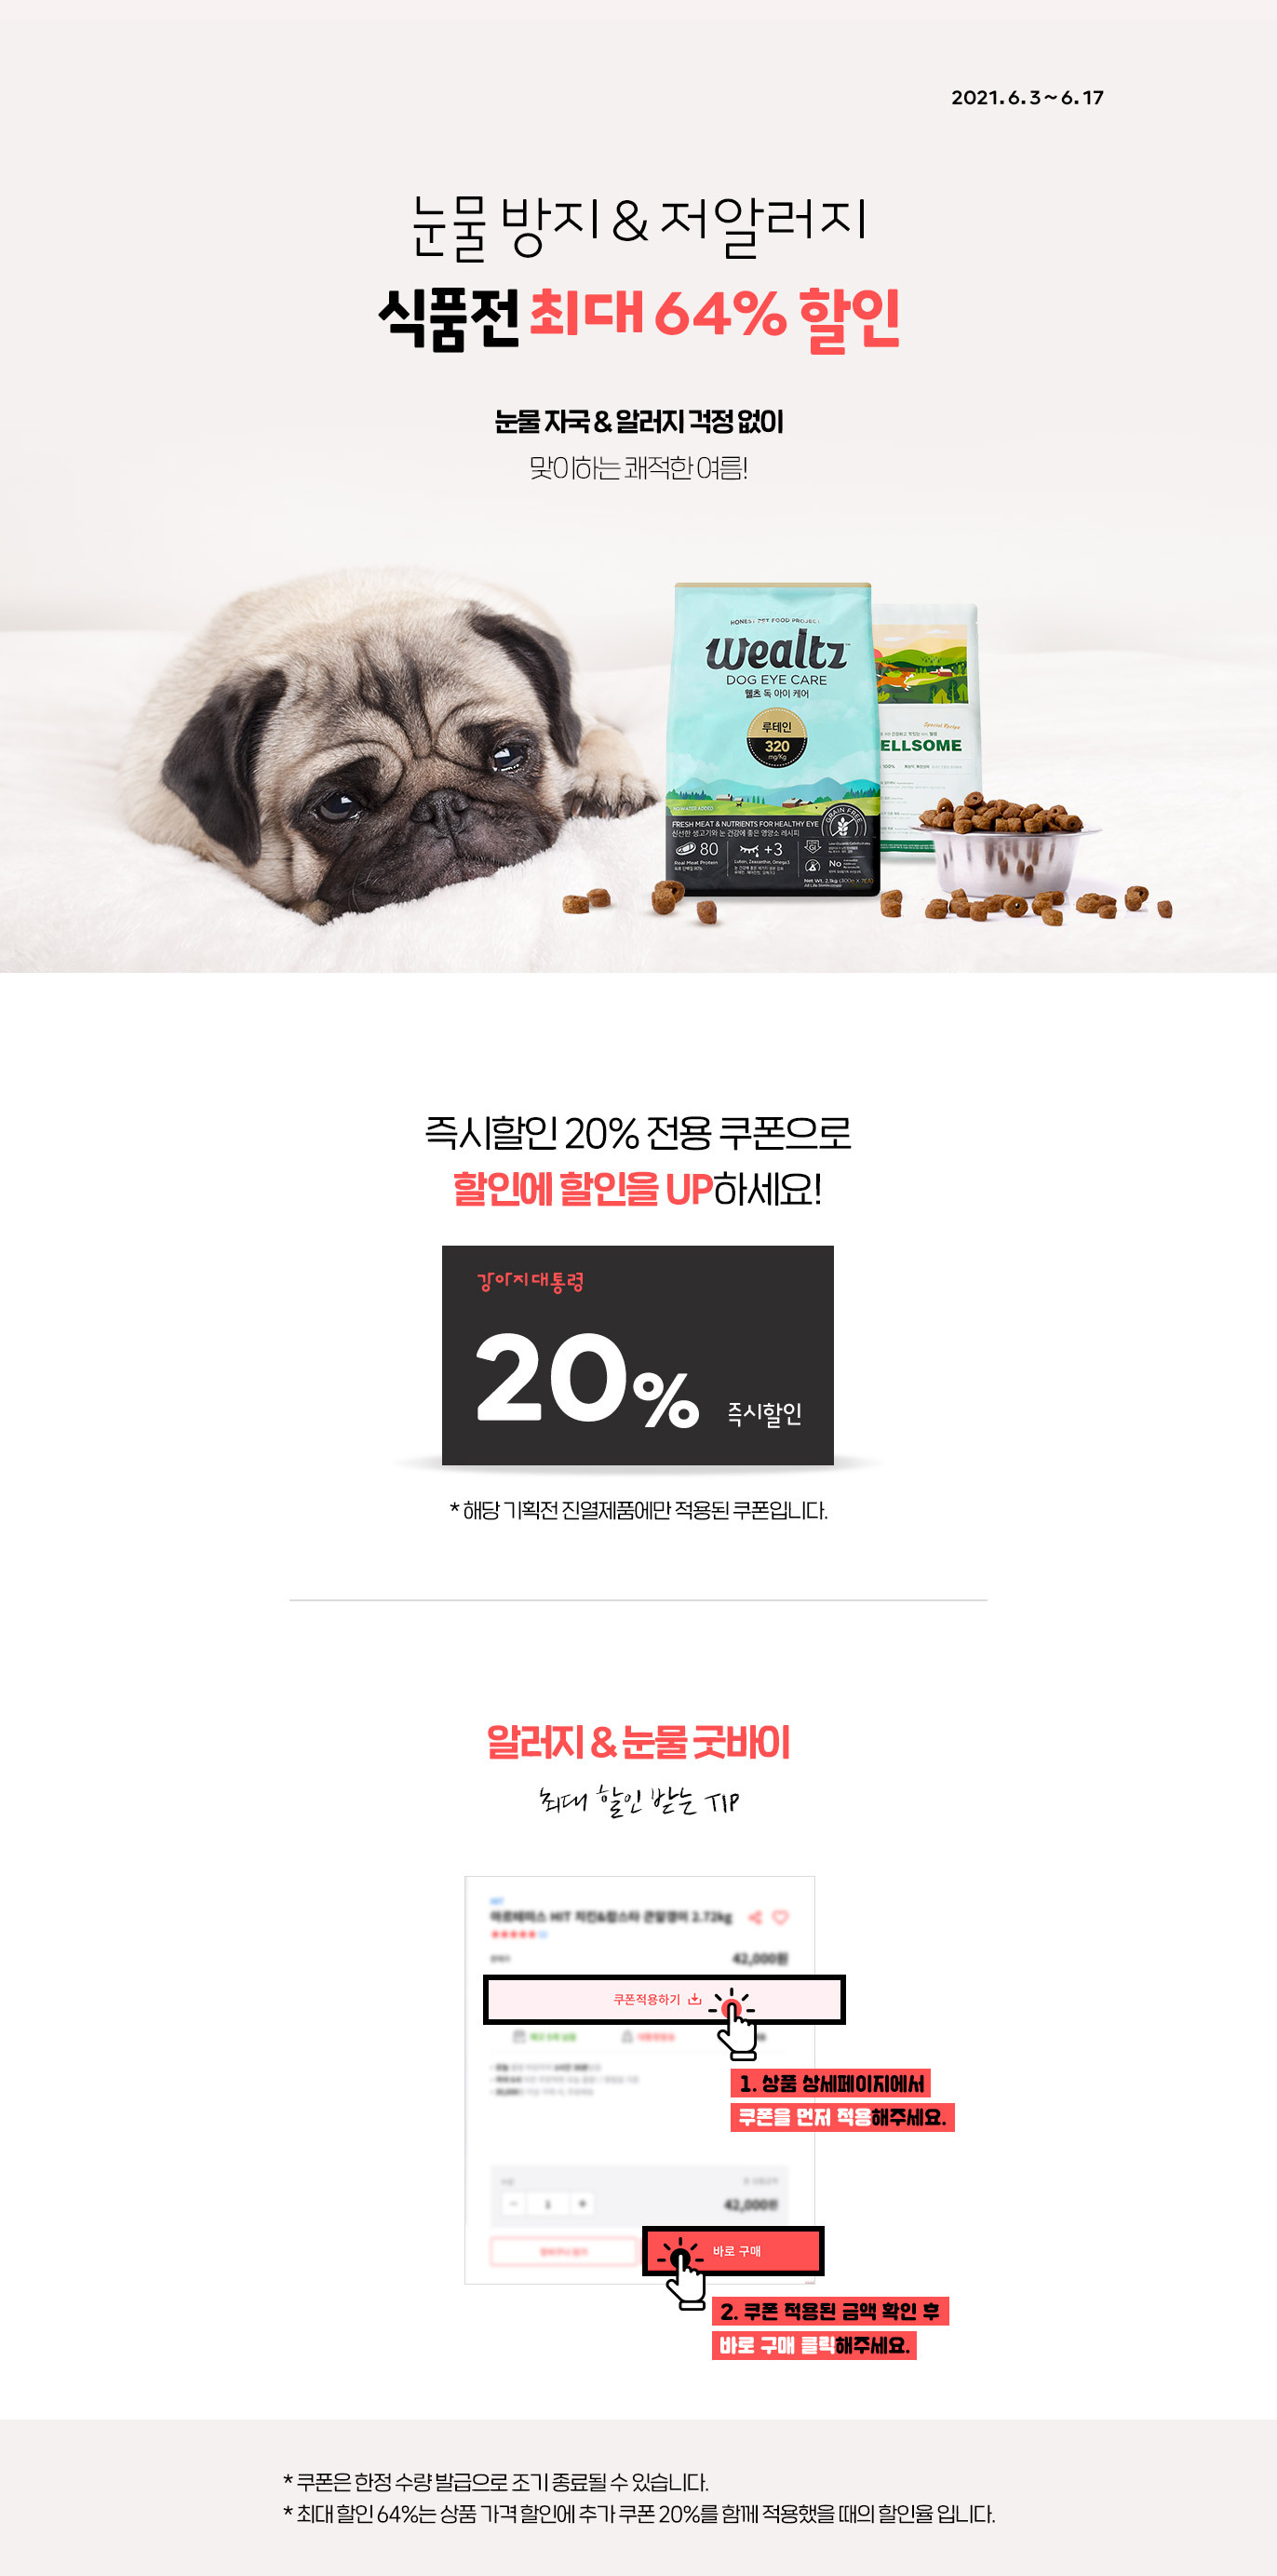 https://img.dogpre.com/web/dogpre/event/banner/3420/3420_main_banner_5165.jpg